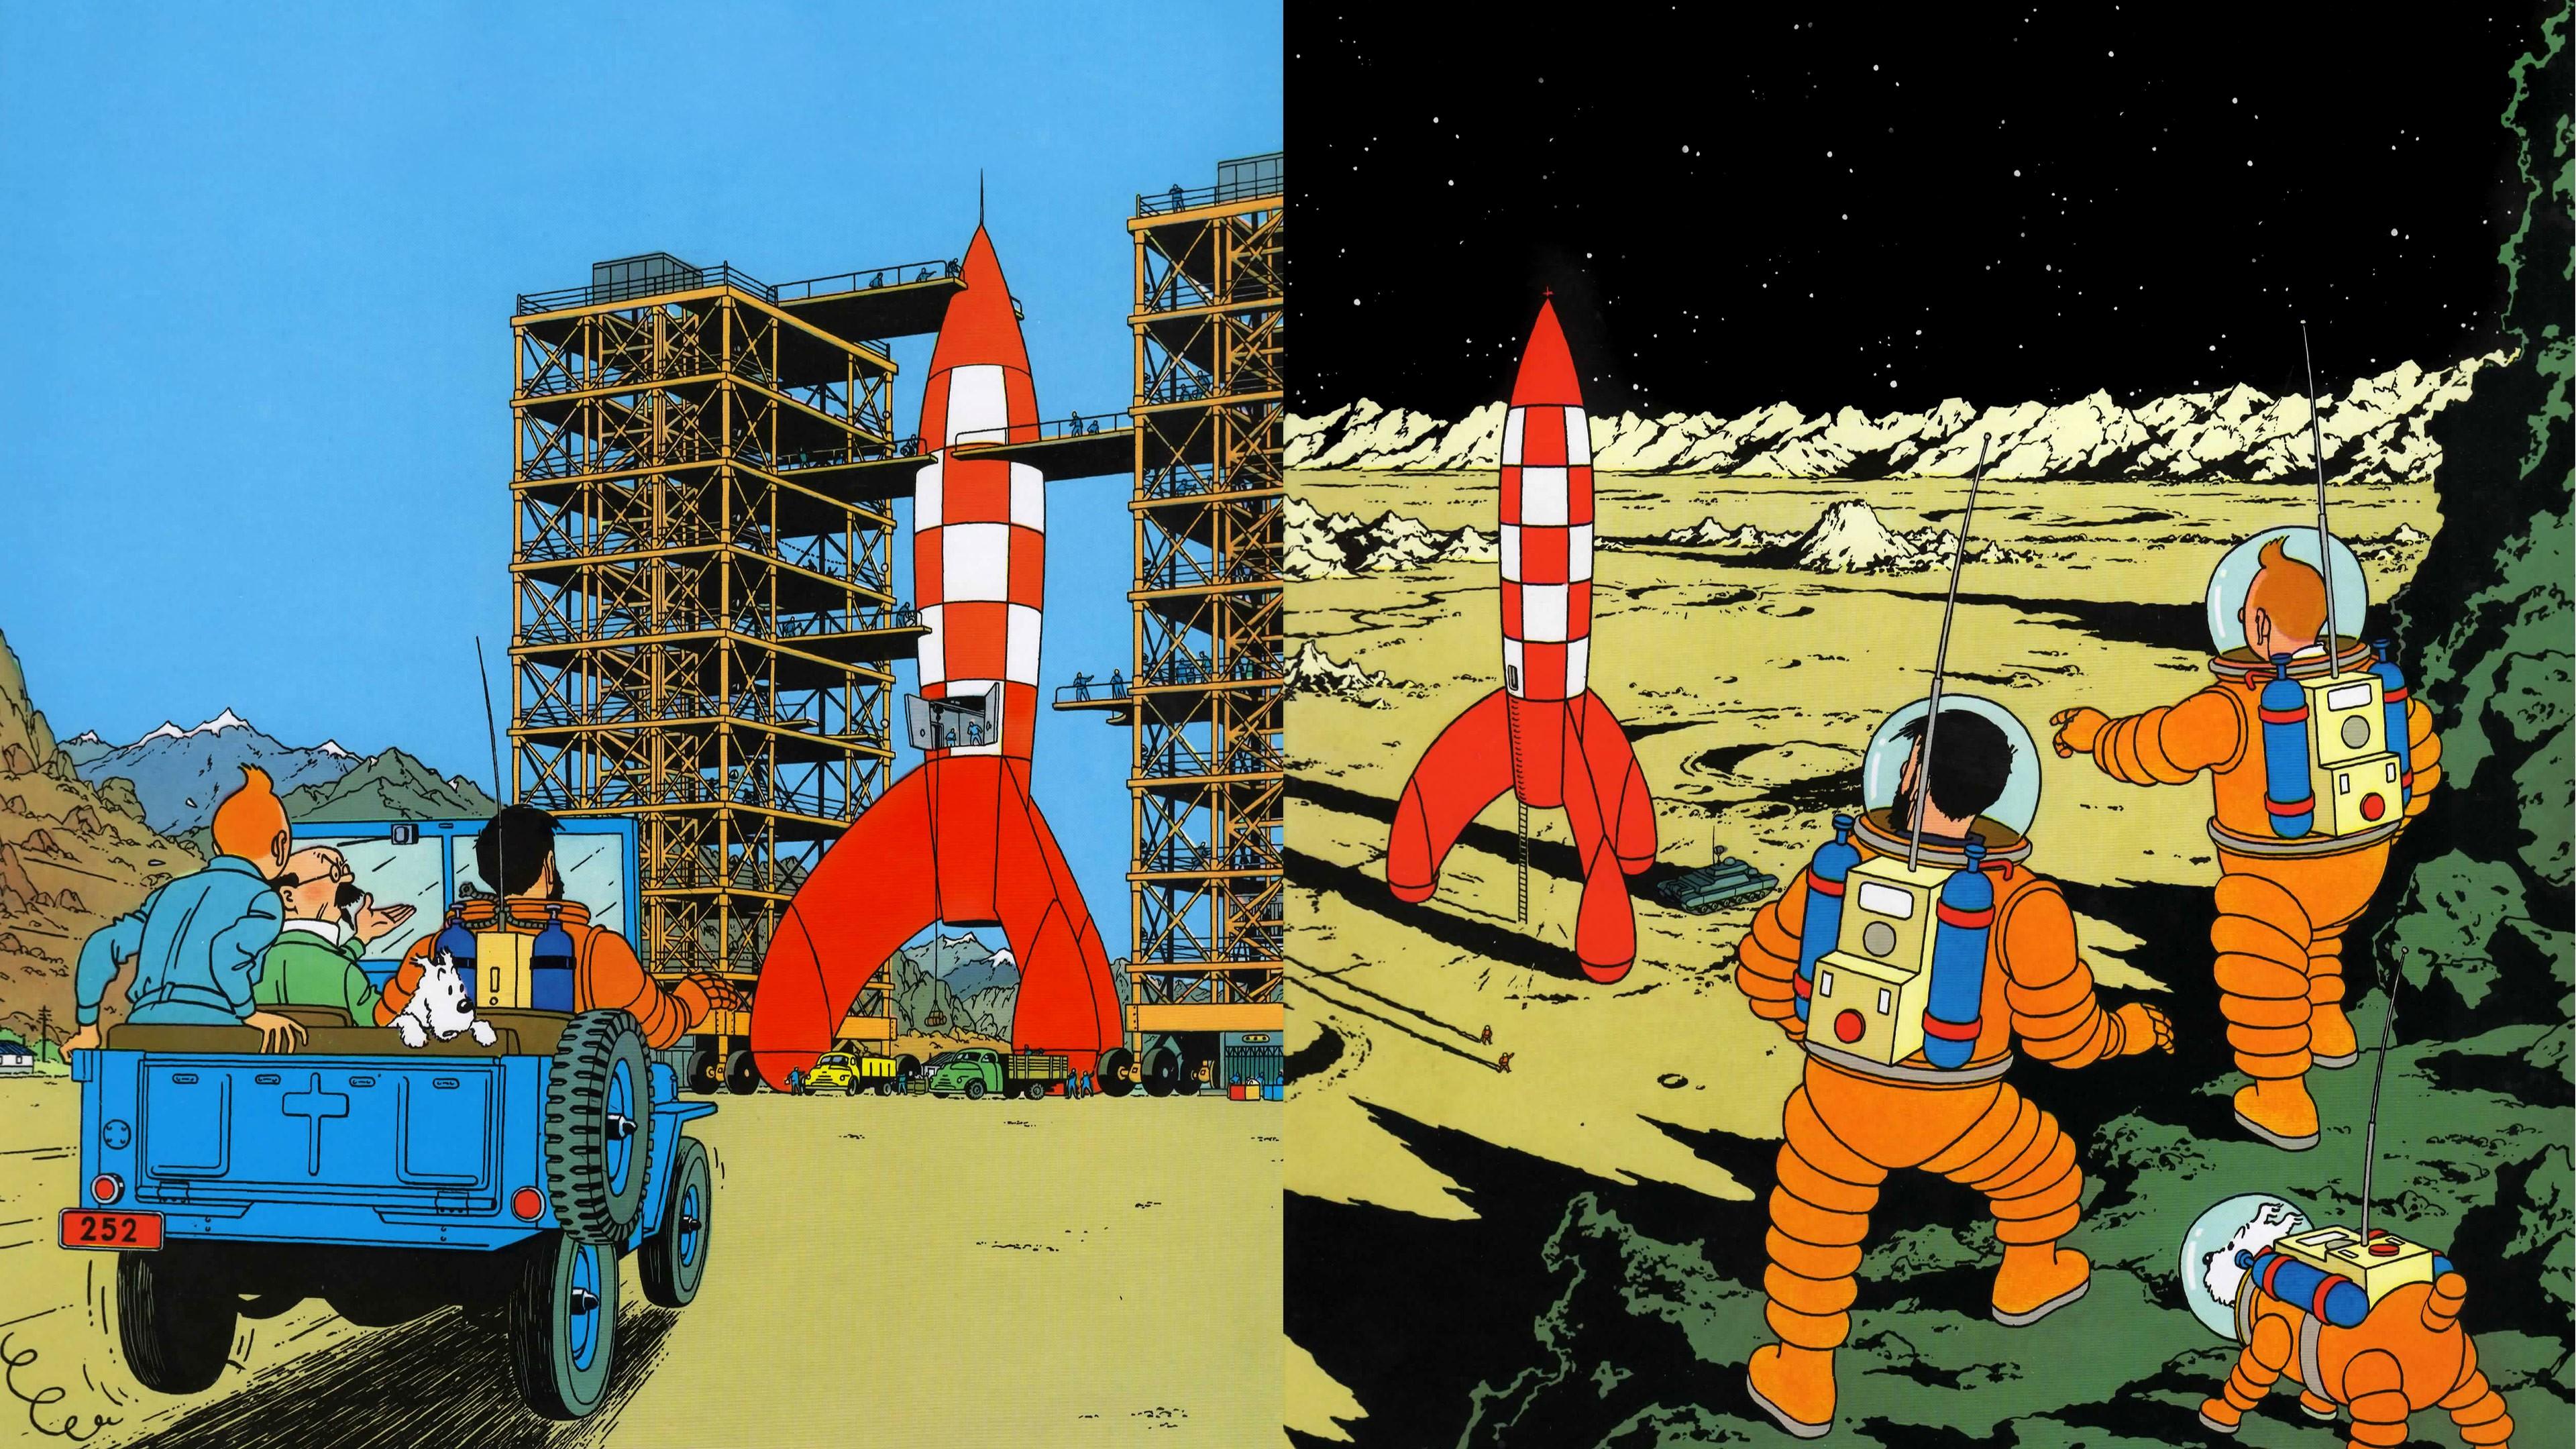 Fond d 39 cran dessin v hicule tintin fus e couverture - Tintin gratuit ...